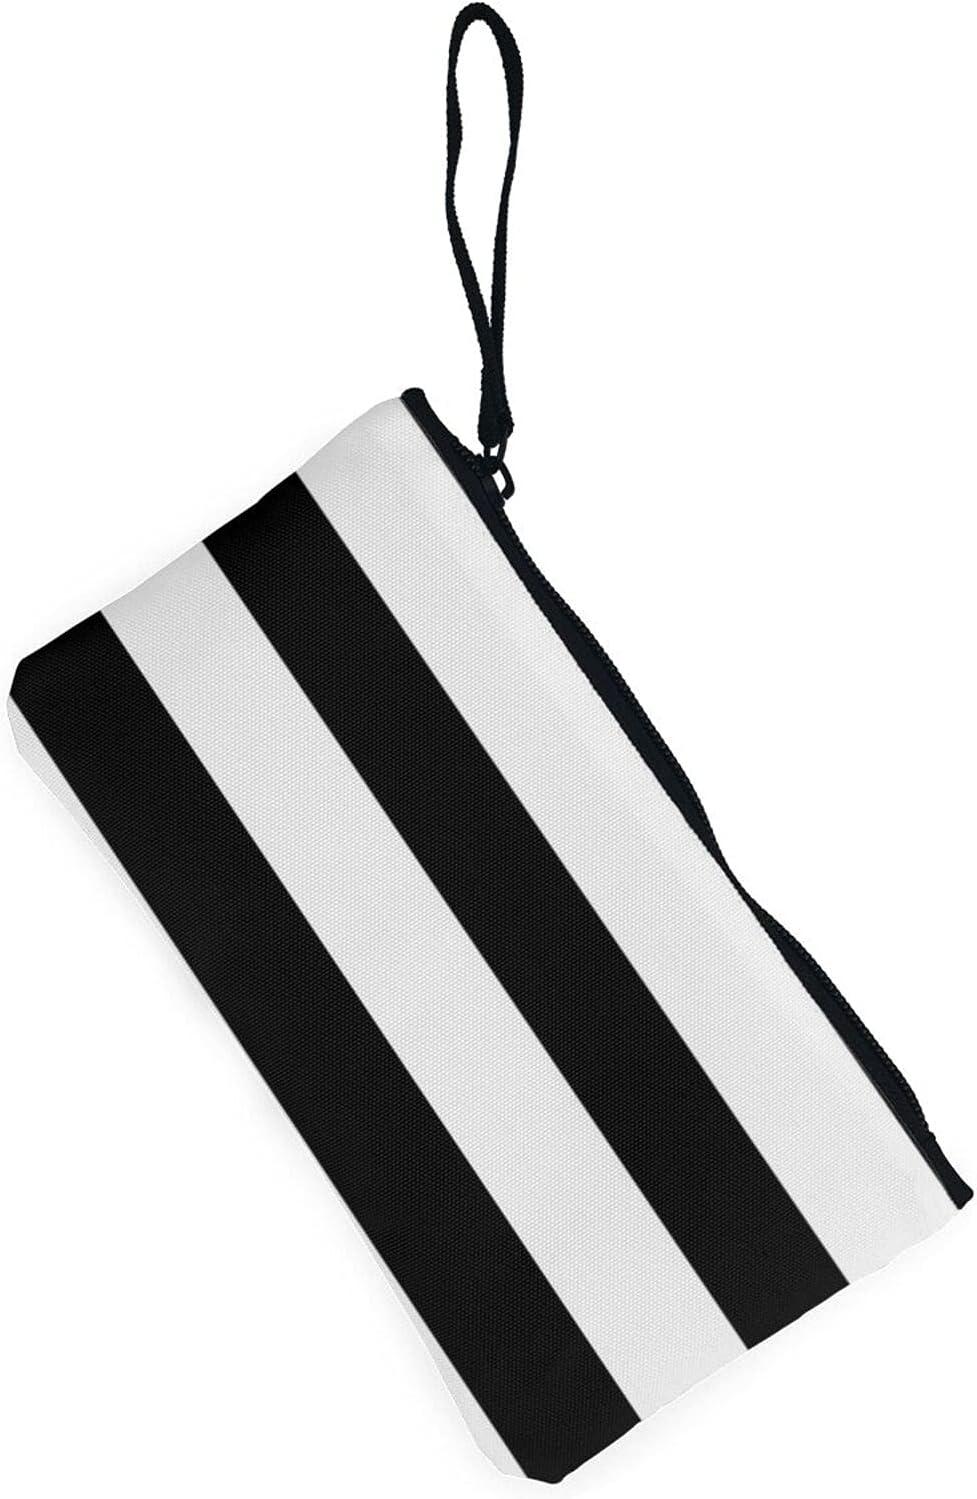 AORRUAM Stripes Black White Canvas Coin Purse,Canvas Zipper Pencil Cases,Canvas Change Purse Pouch Mini Wallet Coin Bag